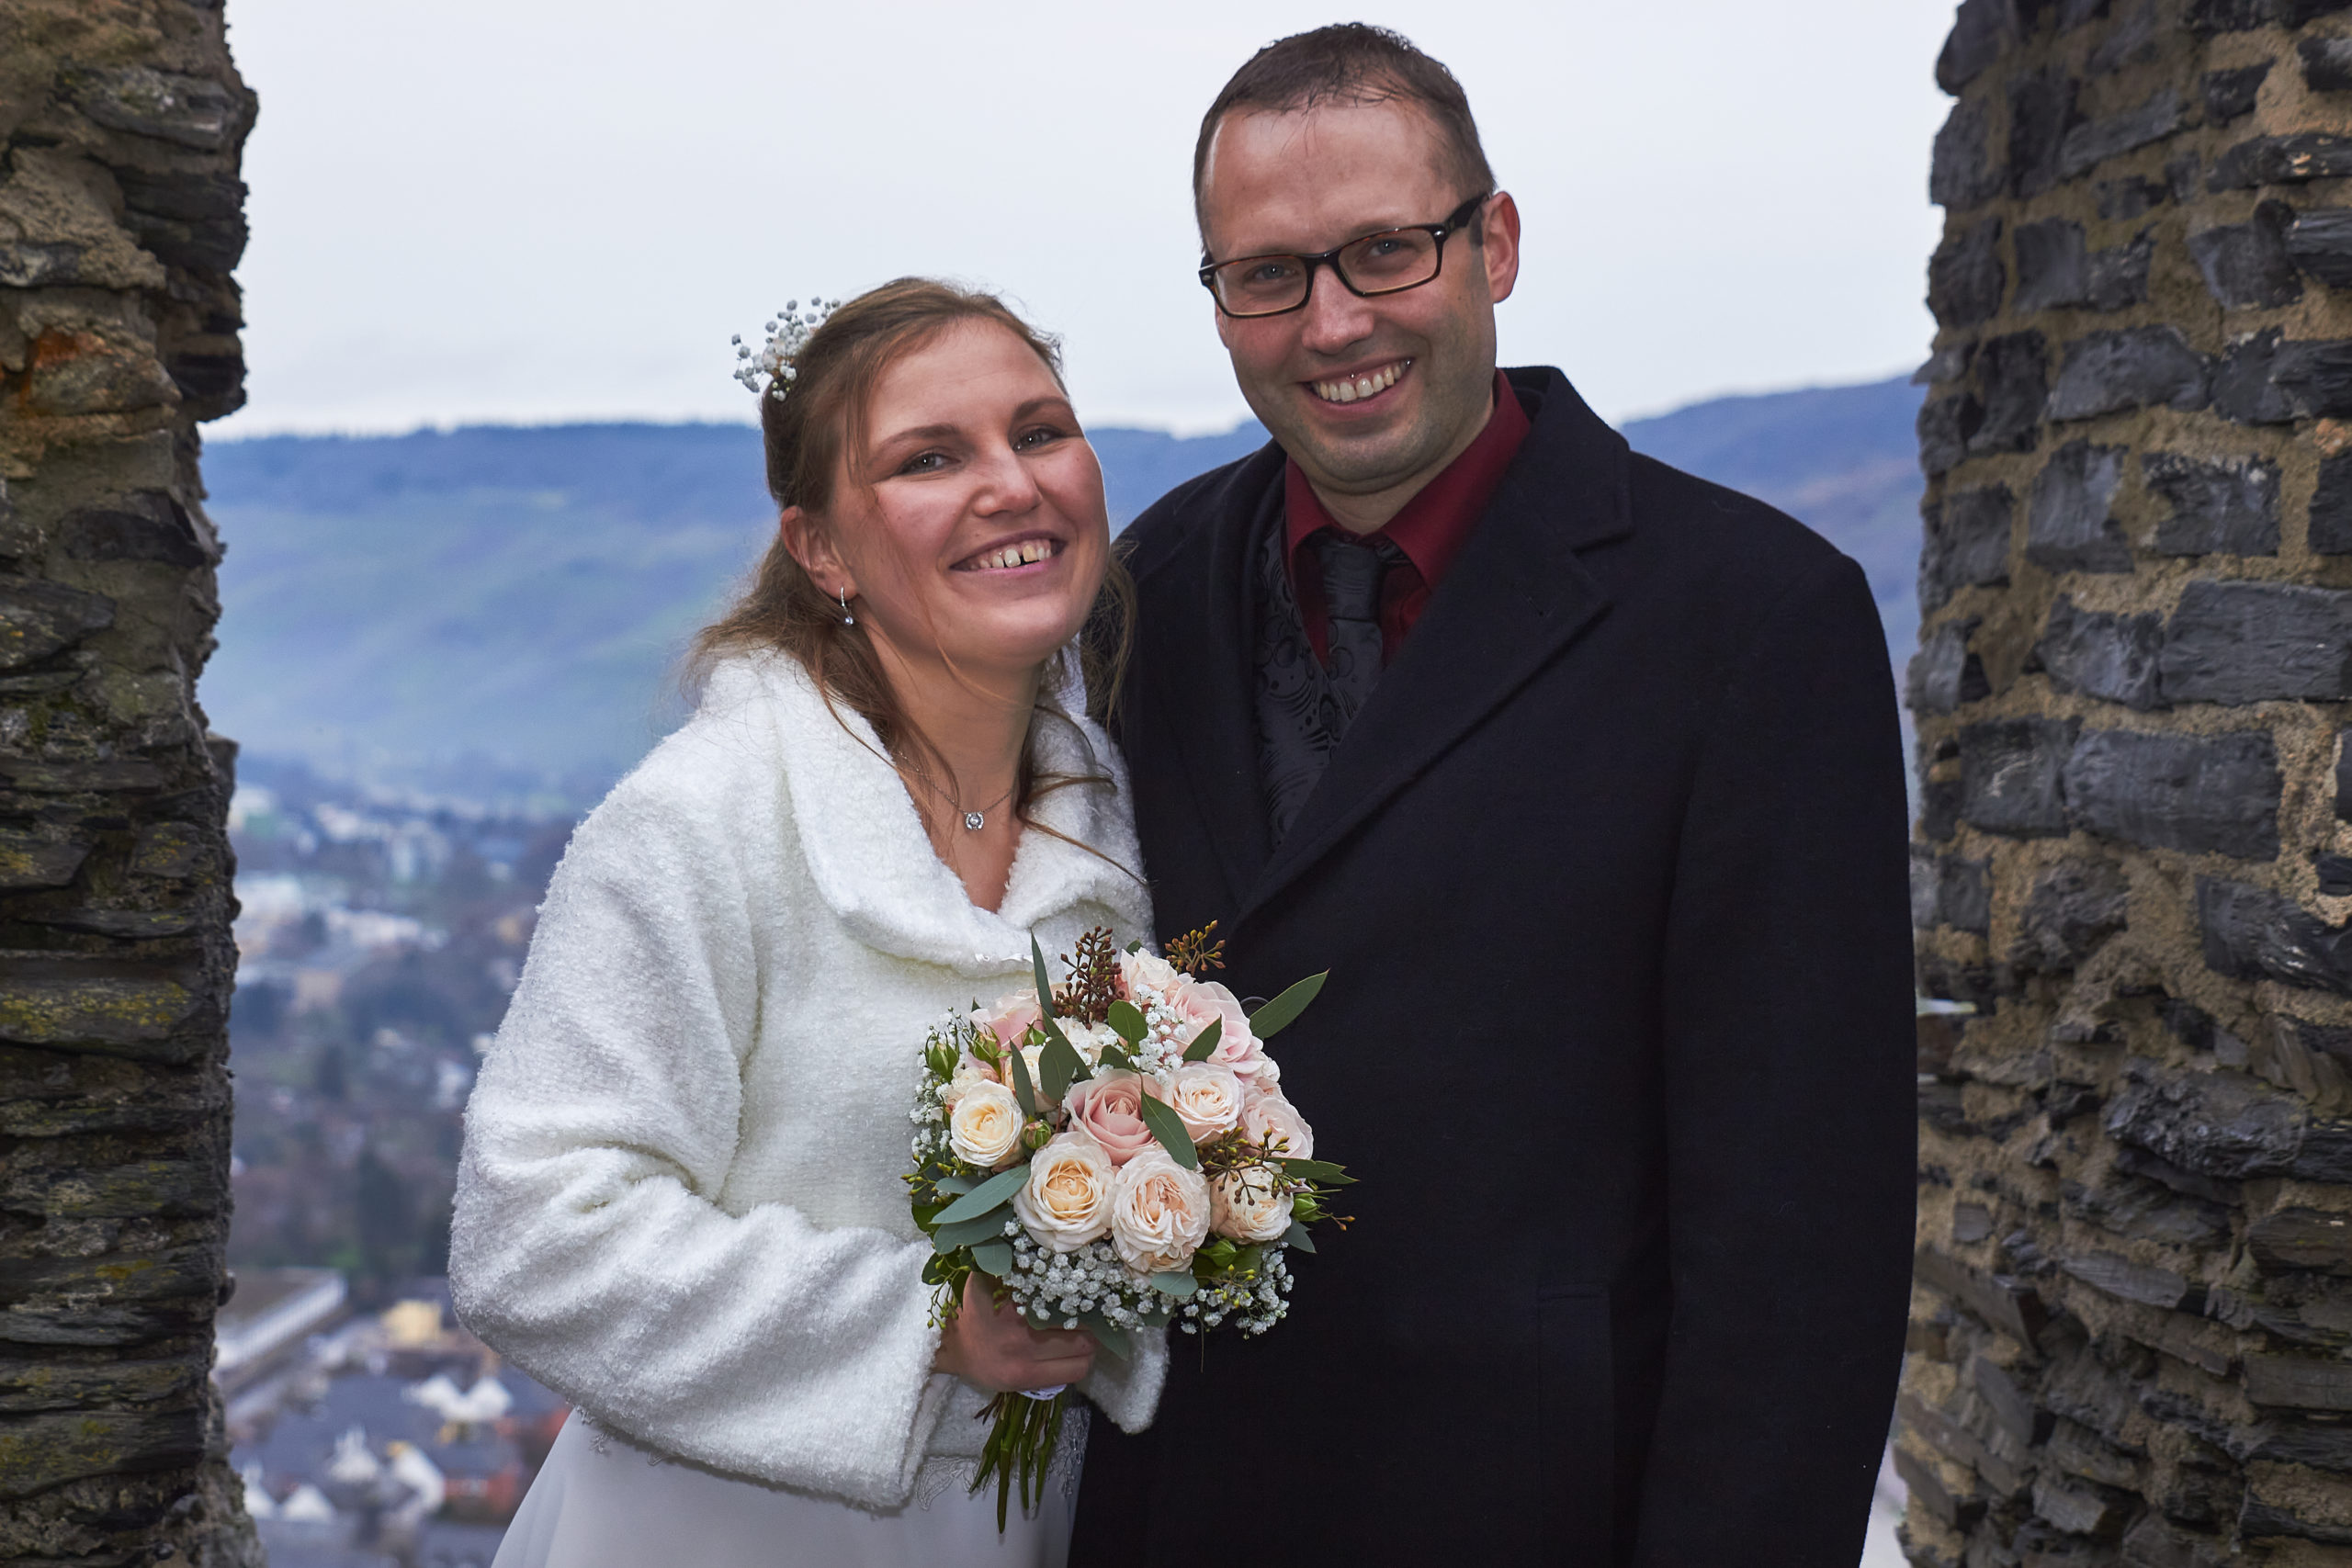 Burg Landshut Hochzeit Portrait Paarshooting Standesamt Fabian Schmidt